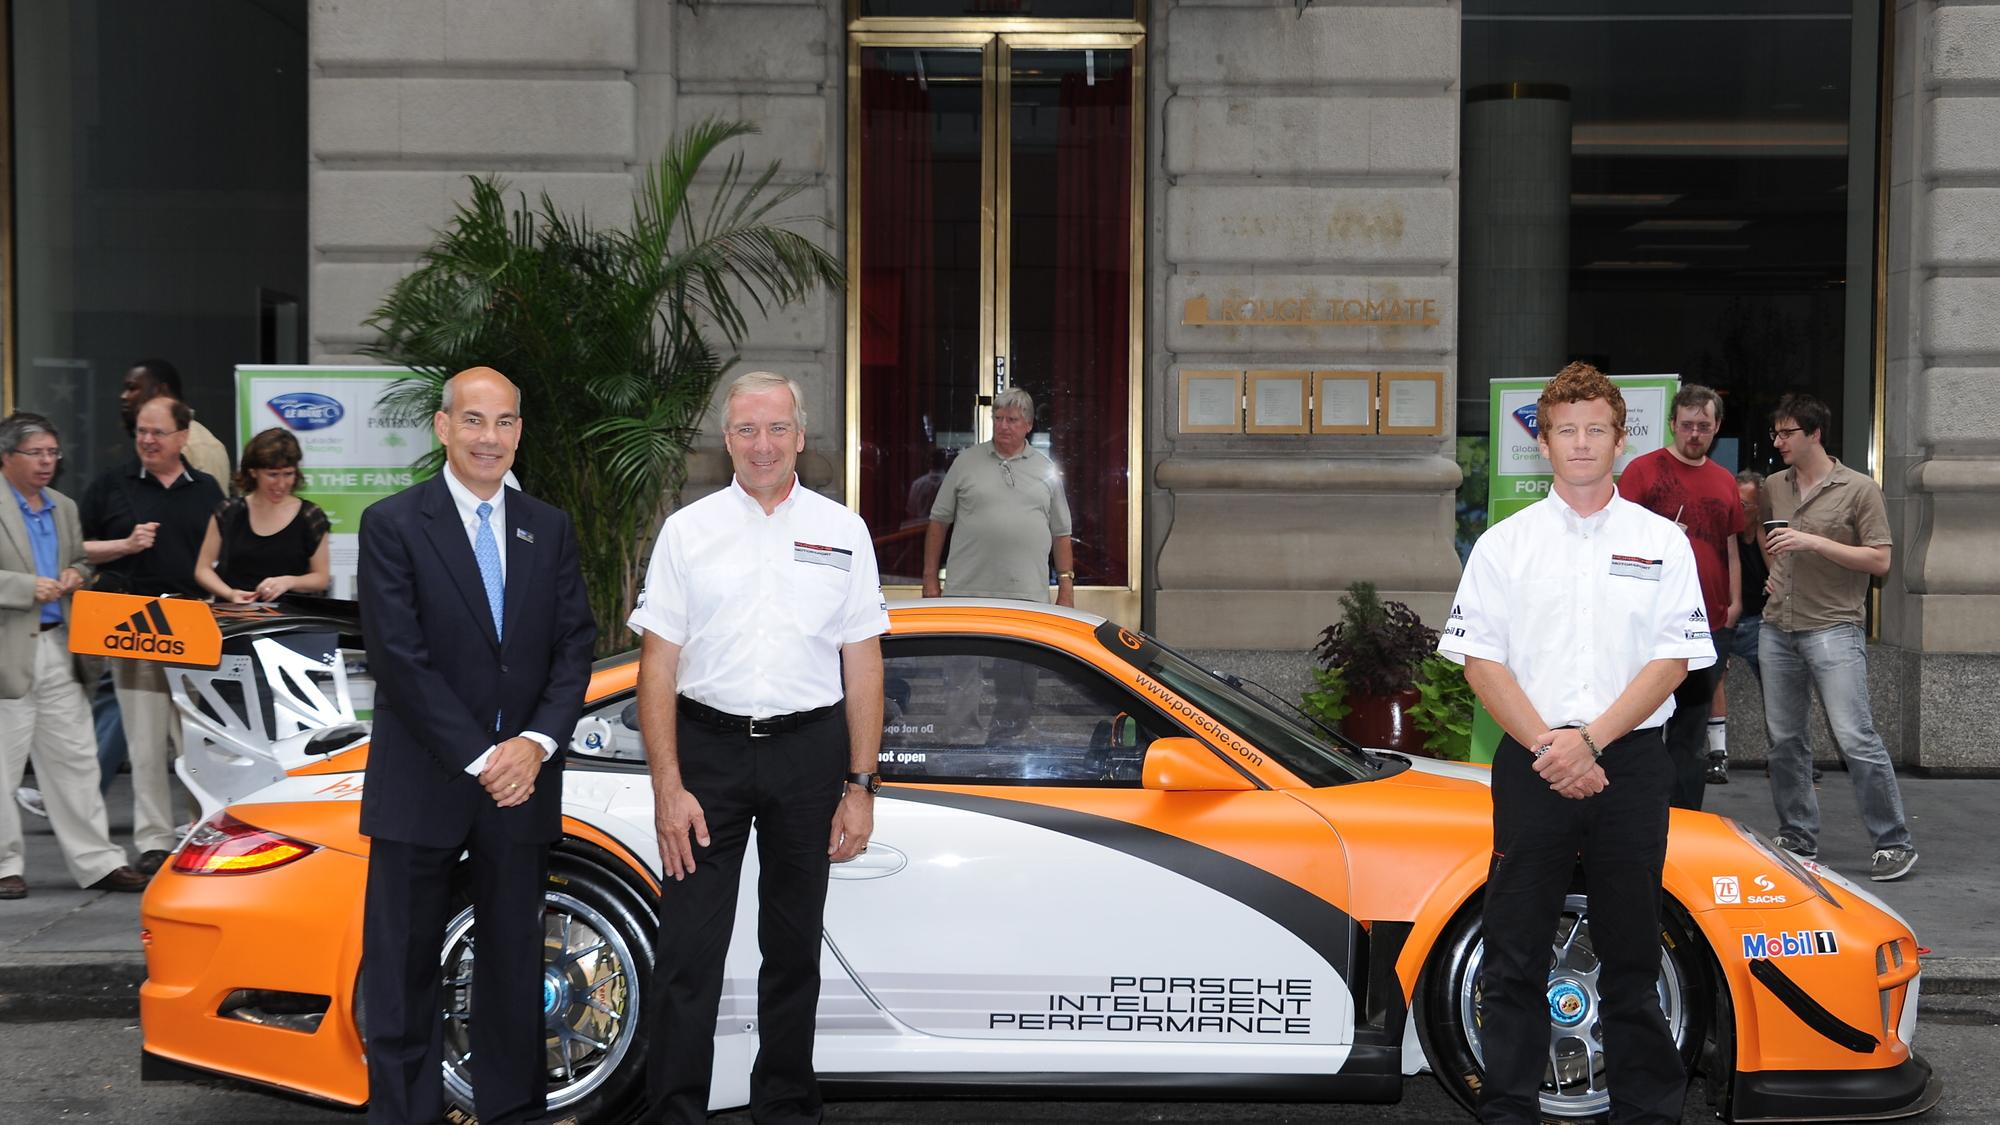 Porsche 911 GT3 R Hybrid; Scott Atherton, ALMS; Paul Ritchie, Porsche; Patrick Long, Porsche driver